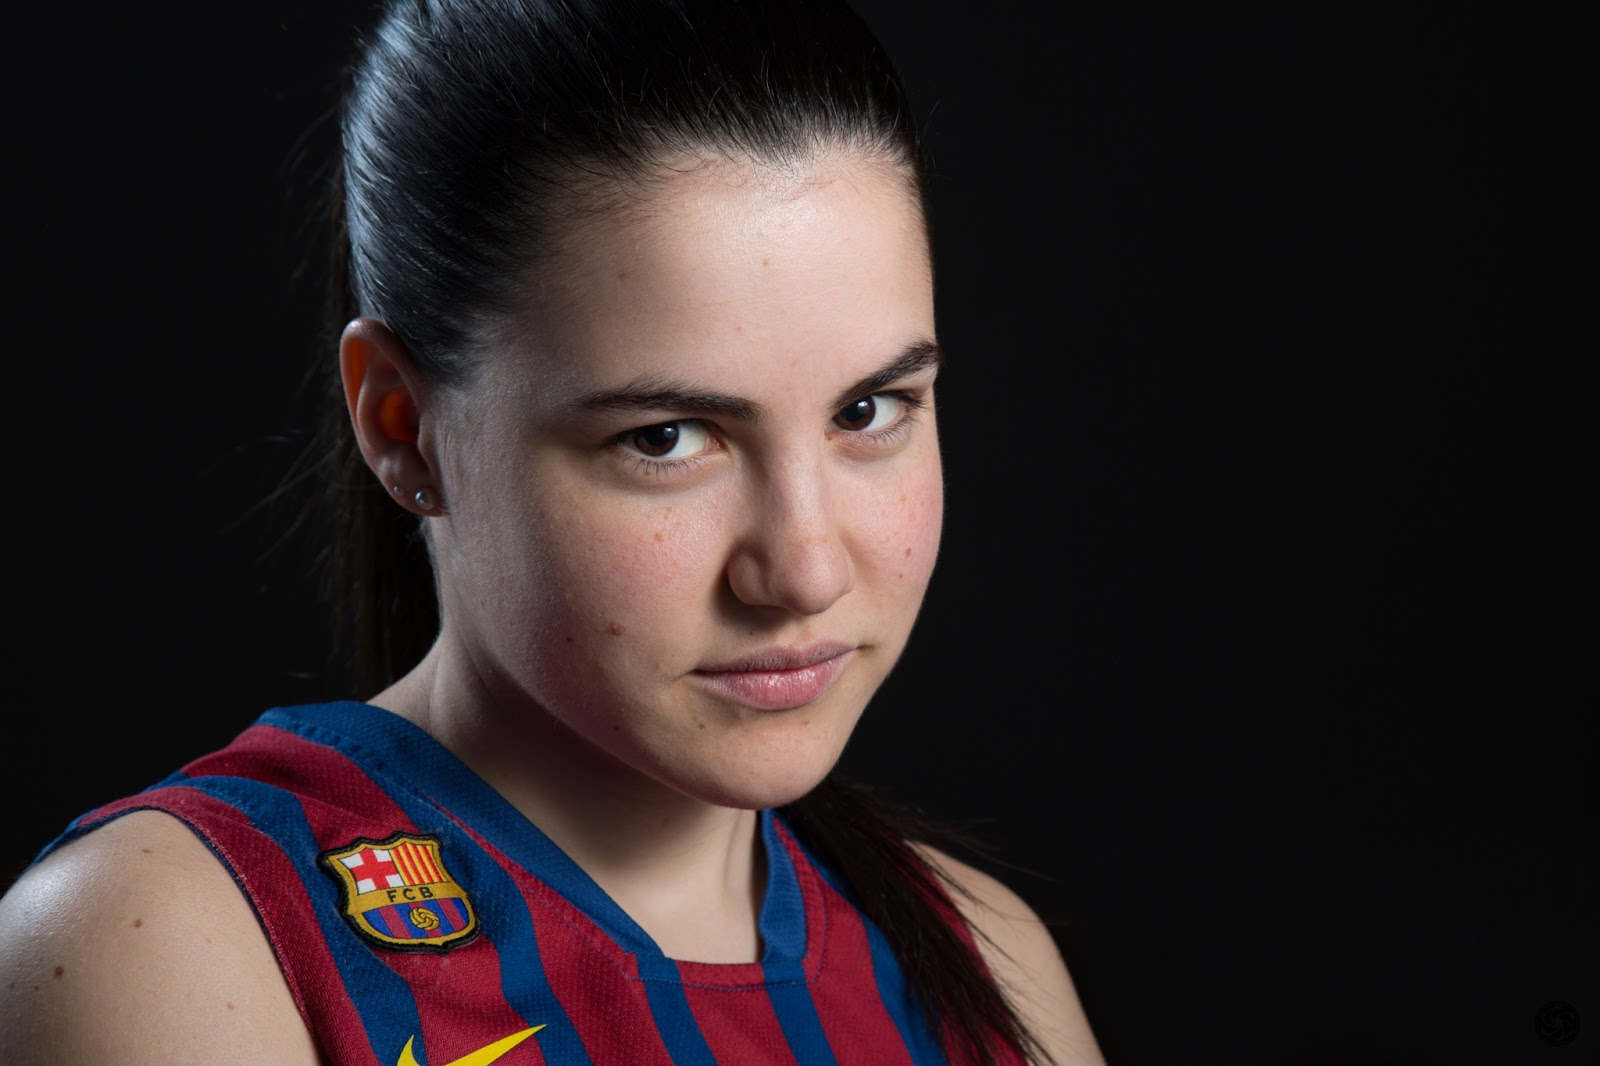 ORIGINAL :: Júlia 14 - CBS Barça Senior Femenino A - 2013 :: Canon EOS 5D MkIII | ISO100 | Canon 24-105 @96mm | f/11 | 1/60s